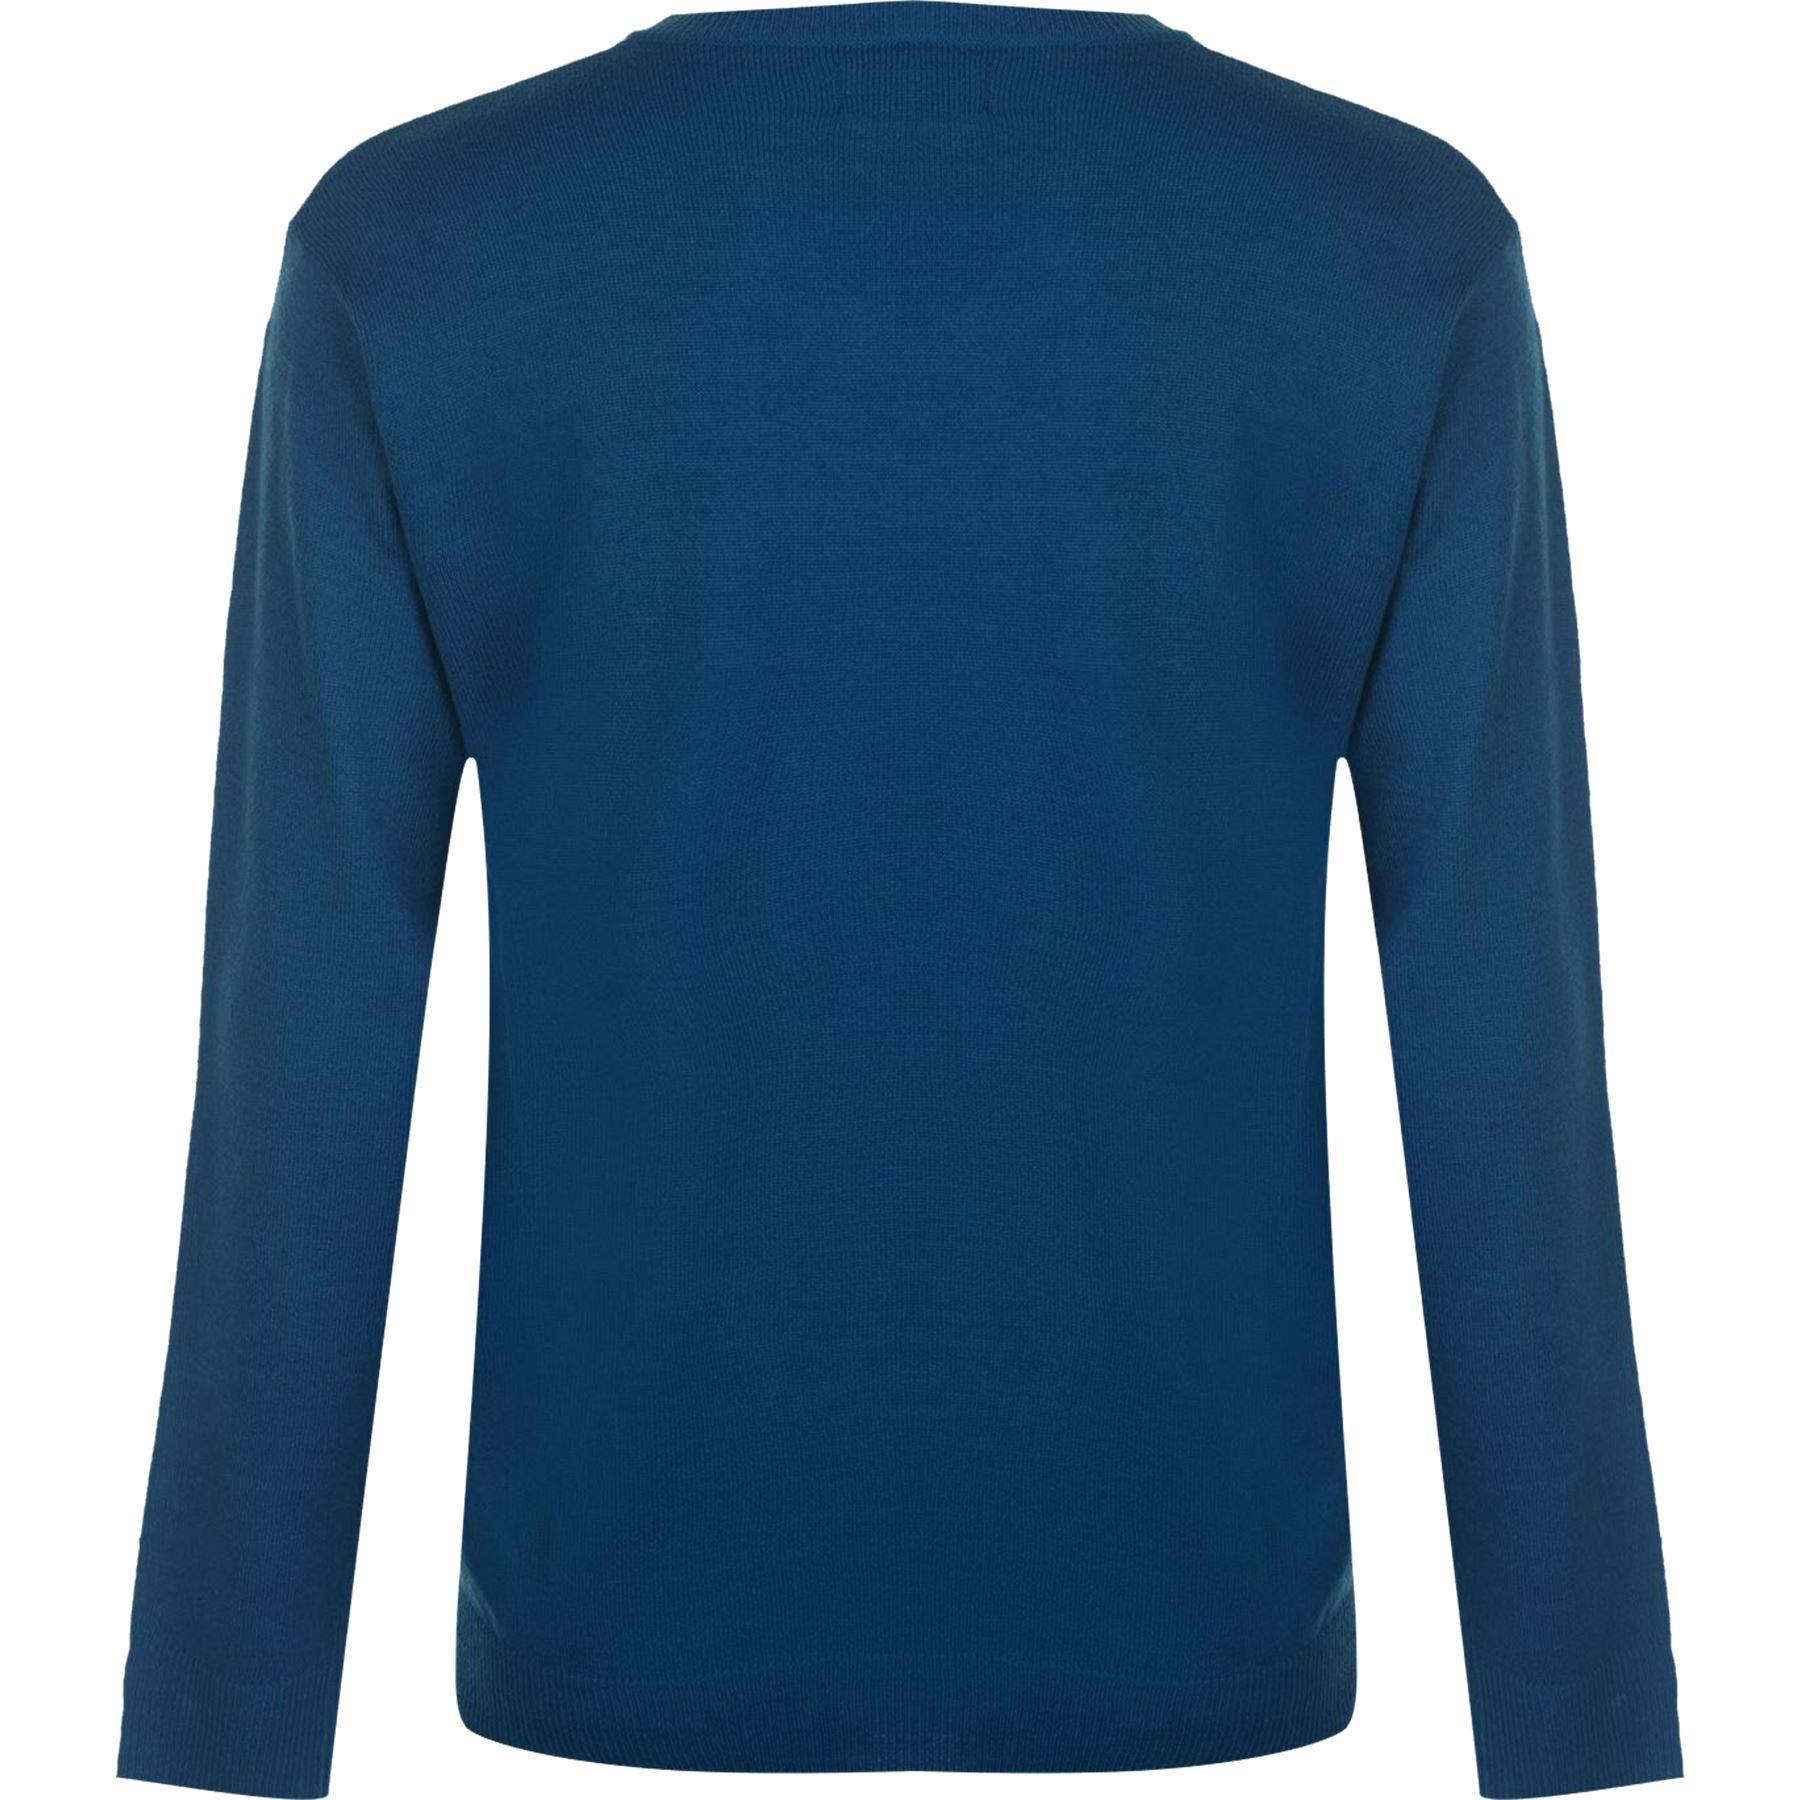 Mens V Neck Jumper Knitted Sweater Pierre Cardin IZOD Top Pullover Knitwear